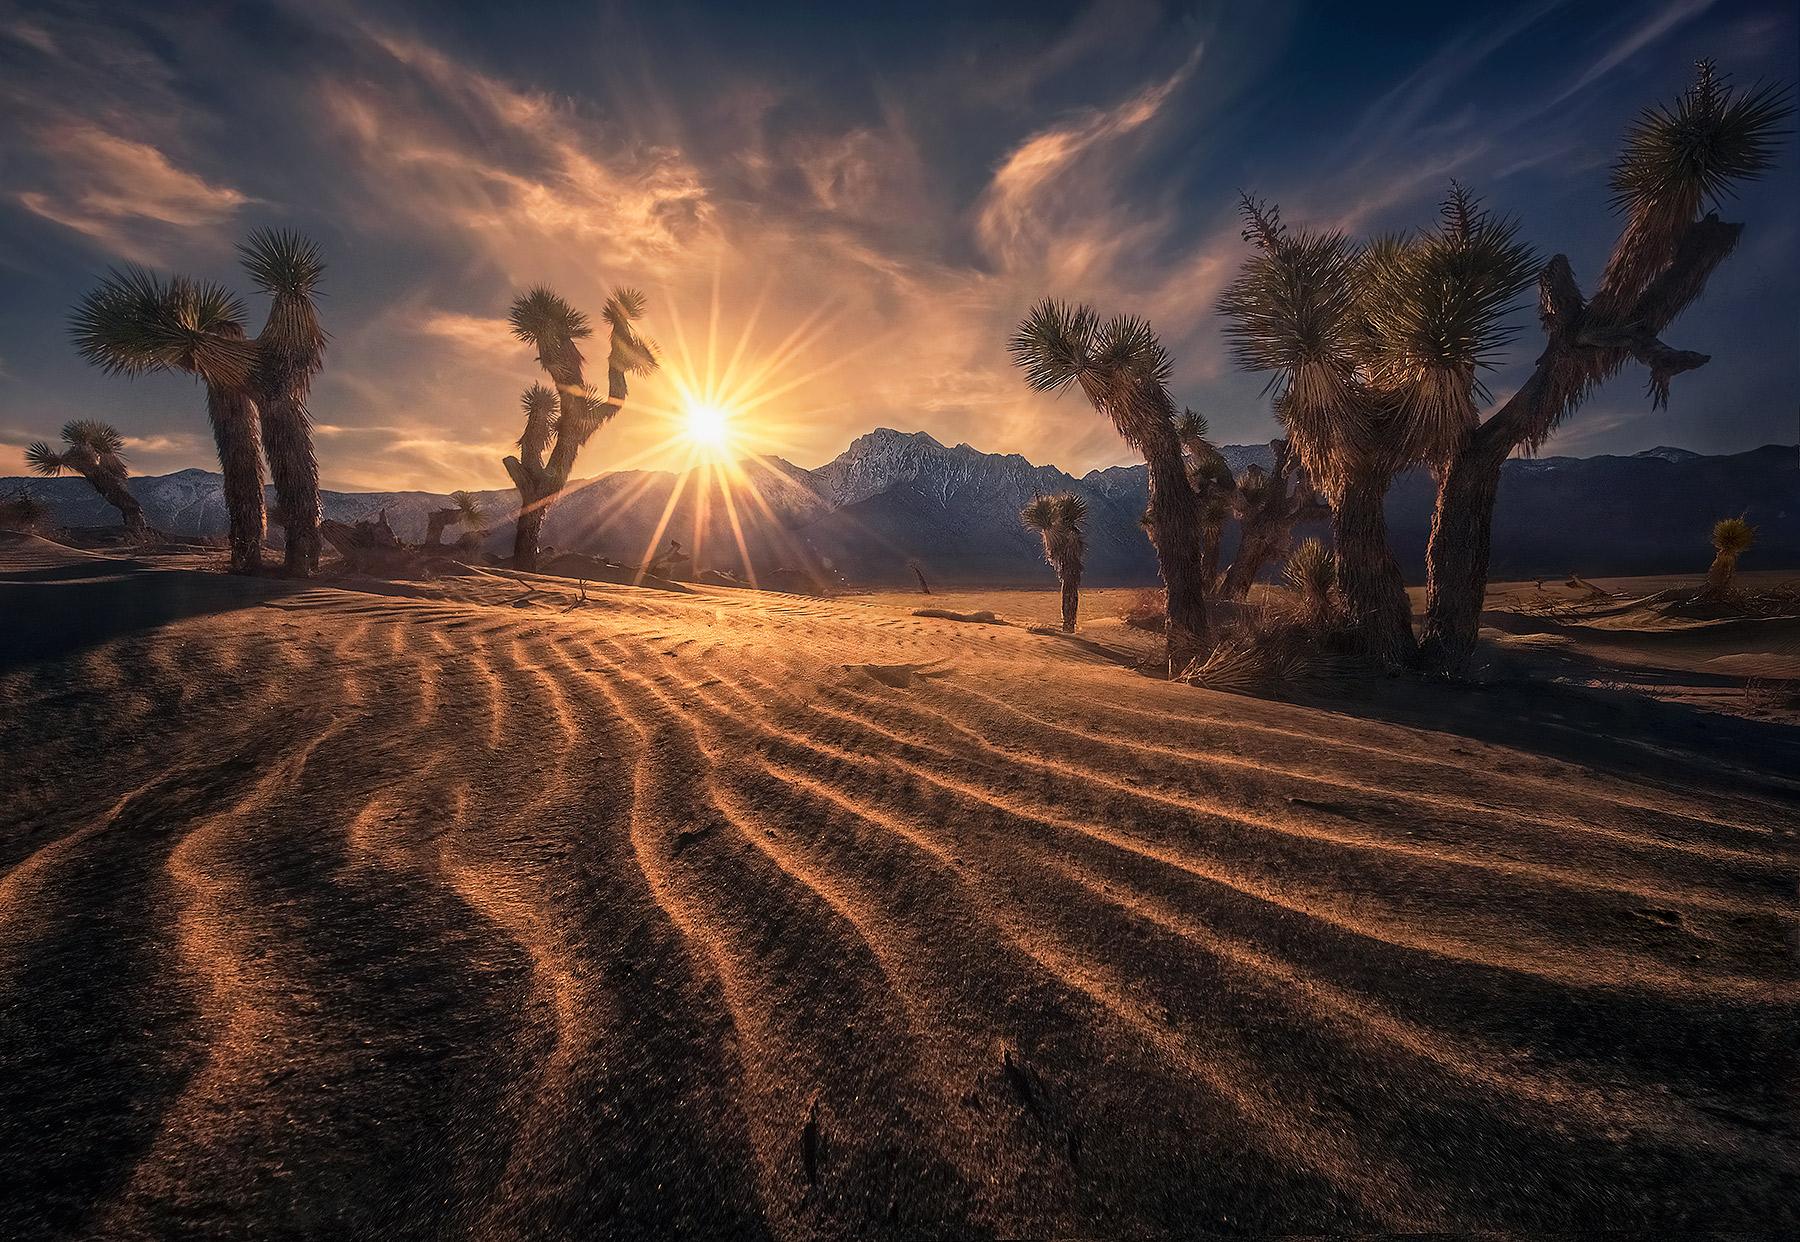 global warming, desertification, desert, sand dunes, dunes, California, Joshua tree, photo